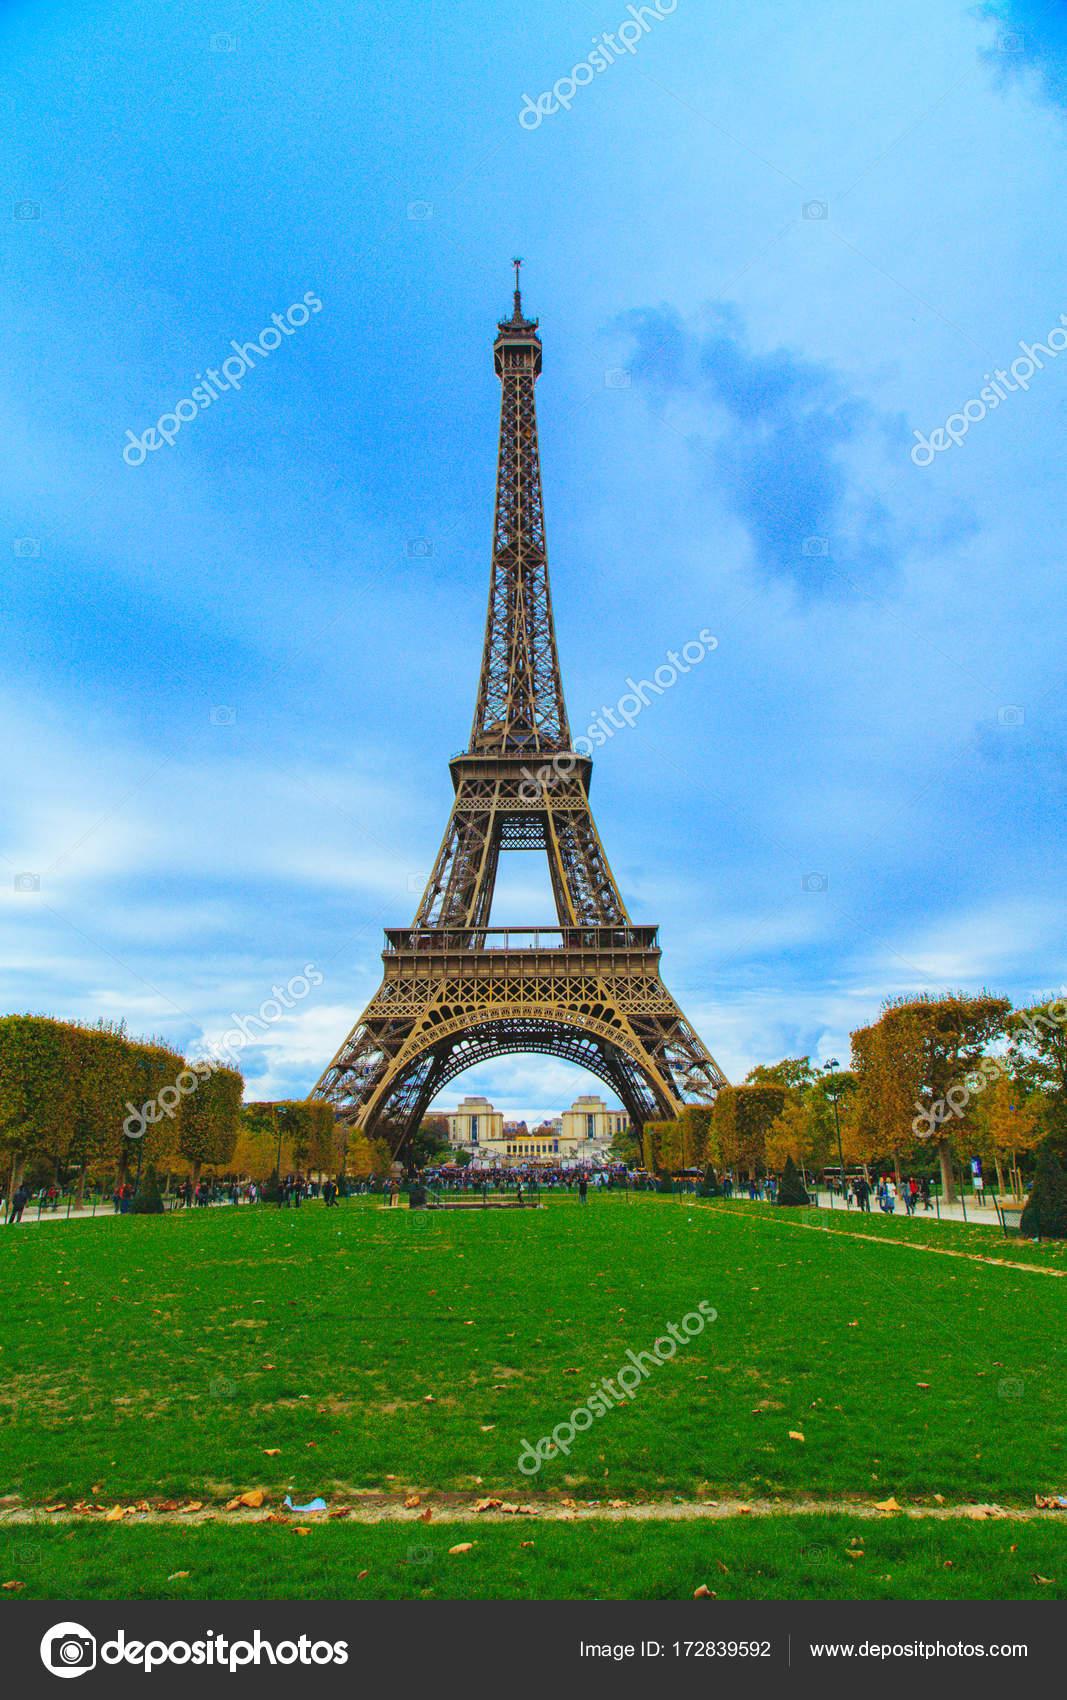 Picture Beautiful Paris Wallpaper Beautiful Eiffel Tower View Paris Empty Park Right Front Tower Stock Photo C Ingus Kruklitis Gmail Com 172839592